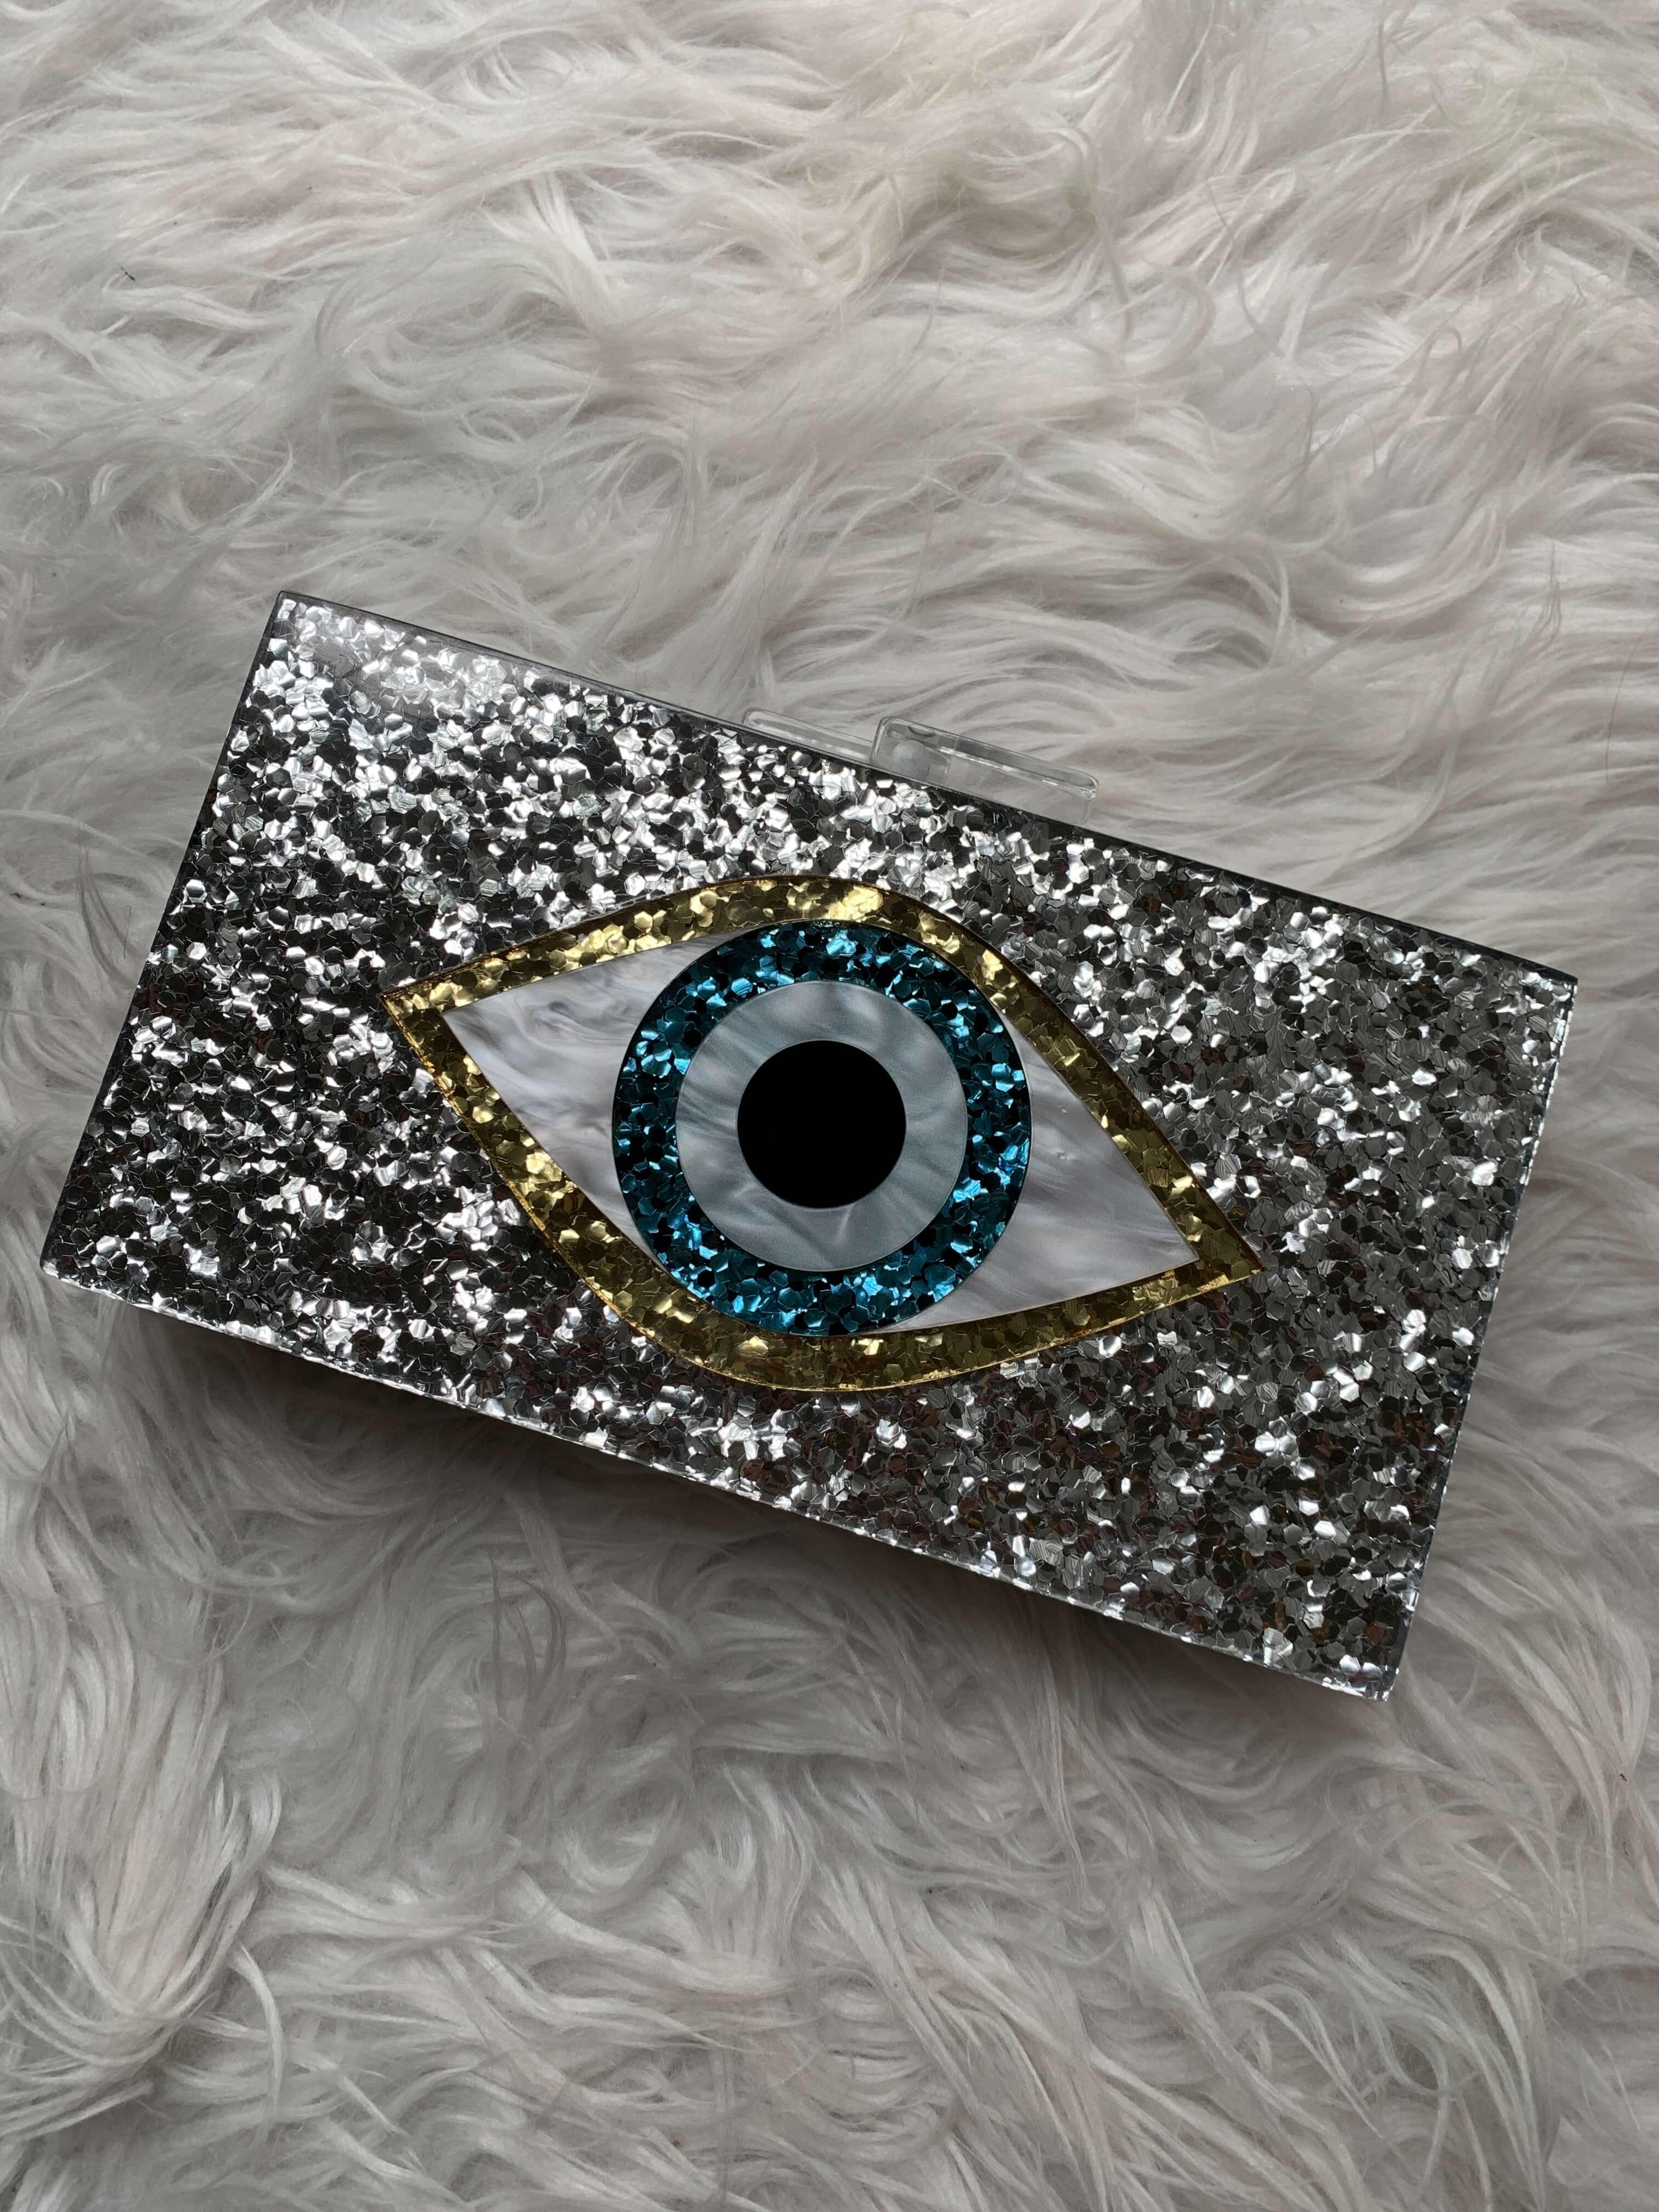 Amazon Fashion Haul evil eye clutch clutch | Style Your Senses